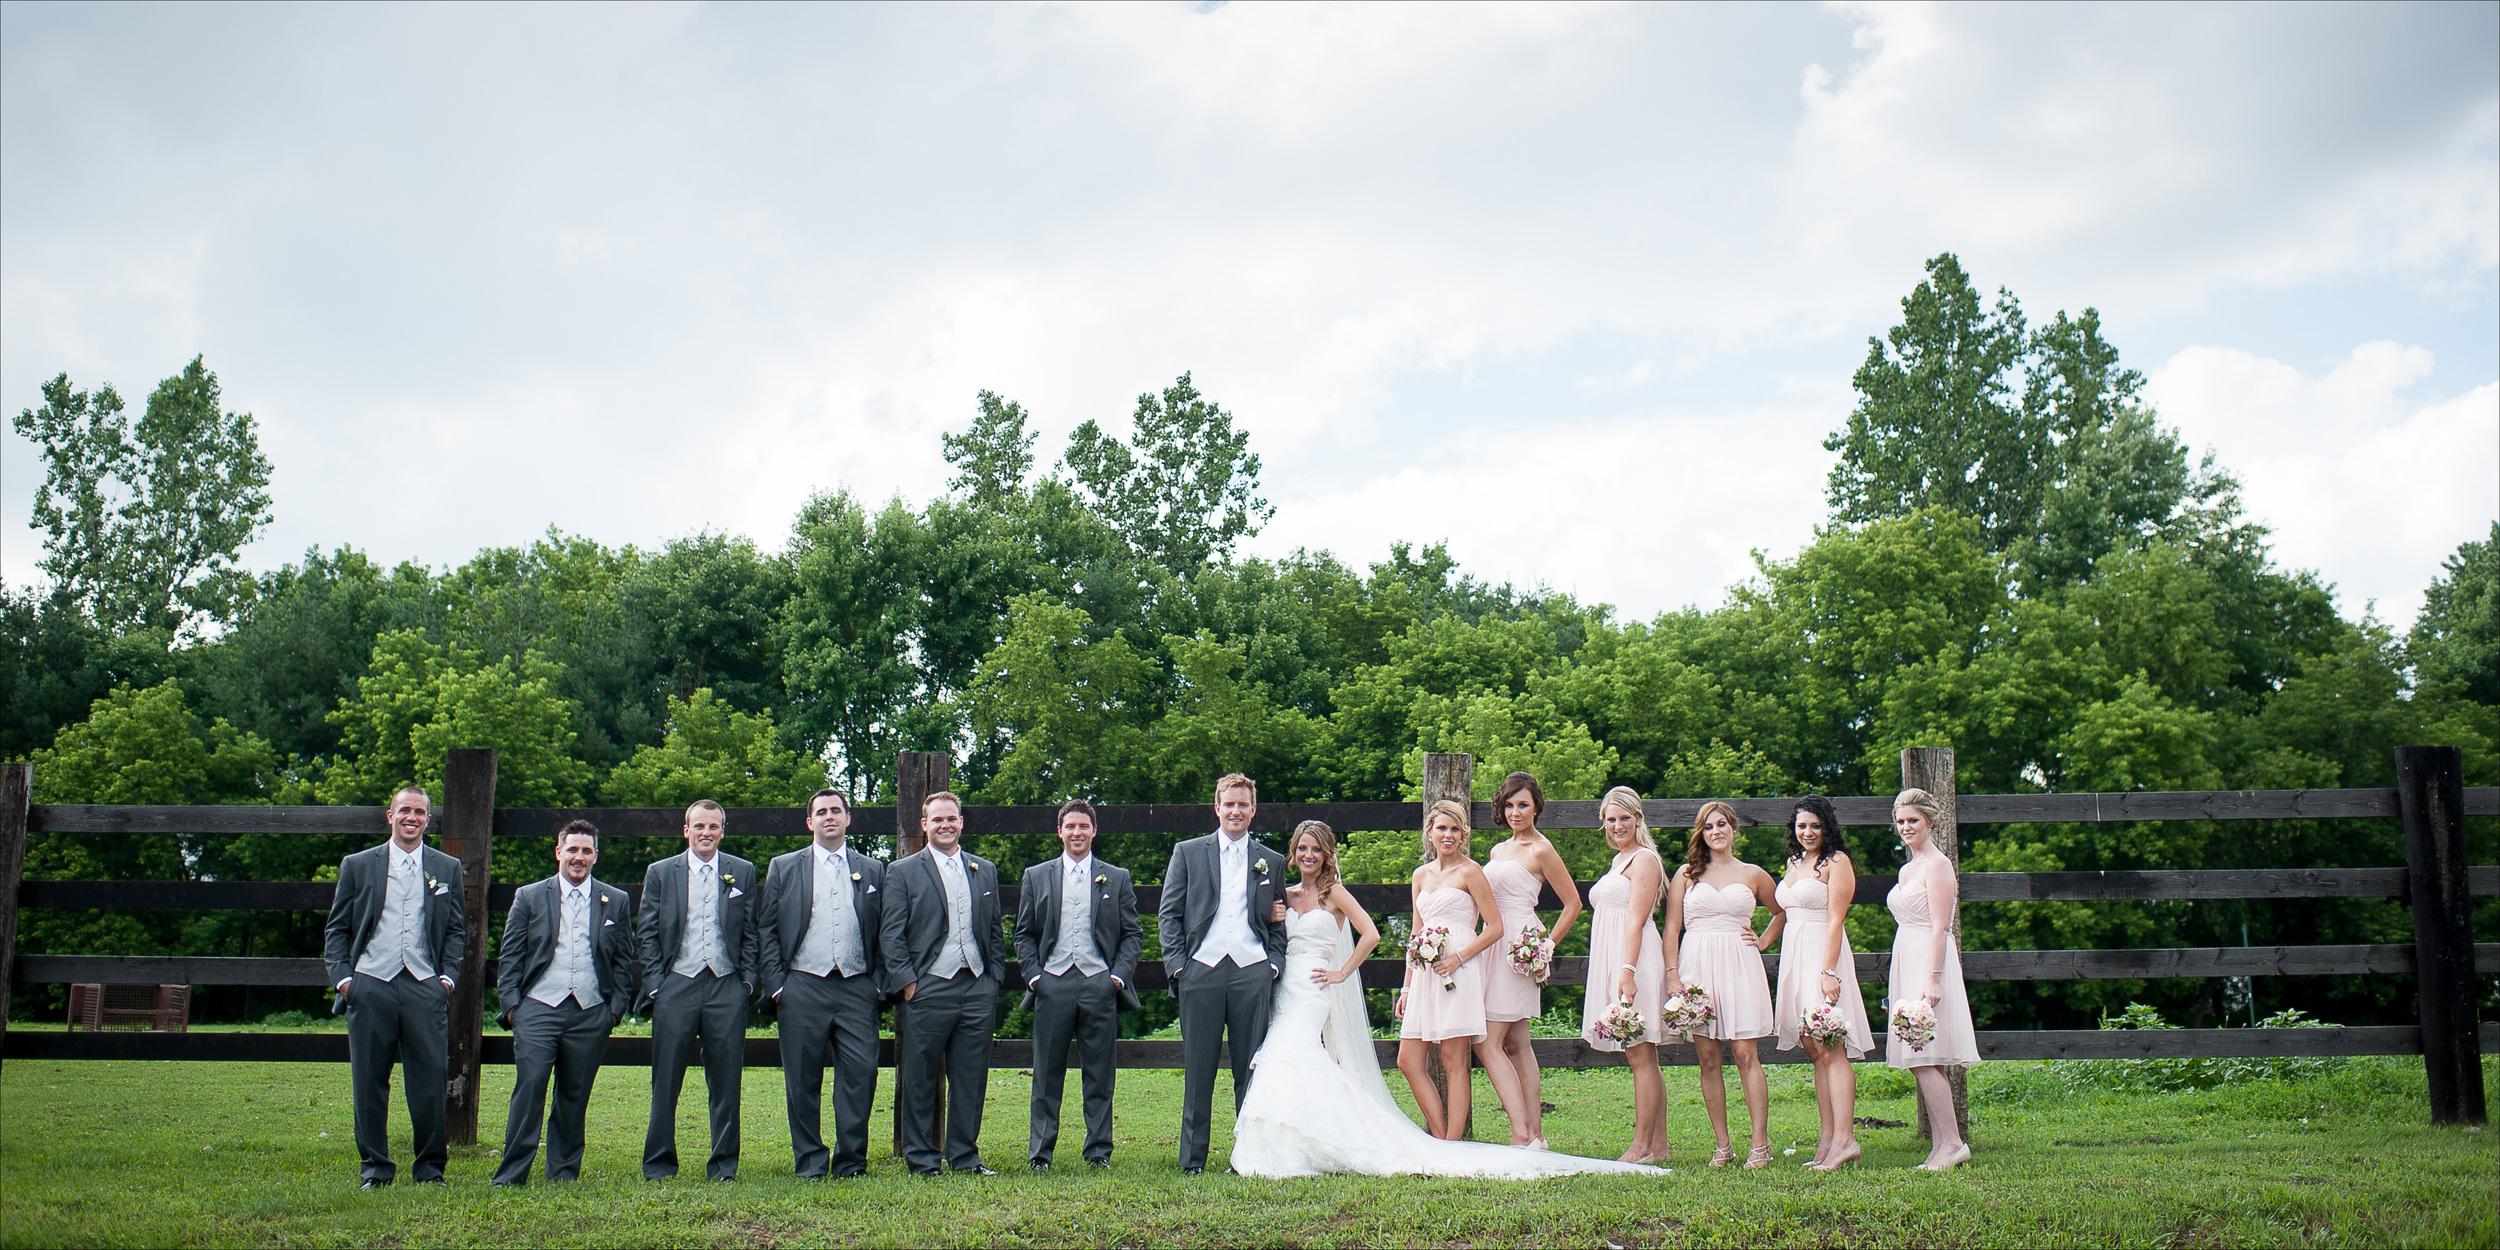 nith-ridge-wedding-album14.jpg